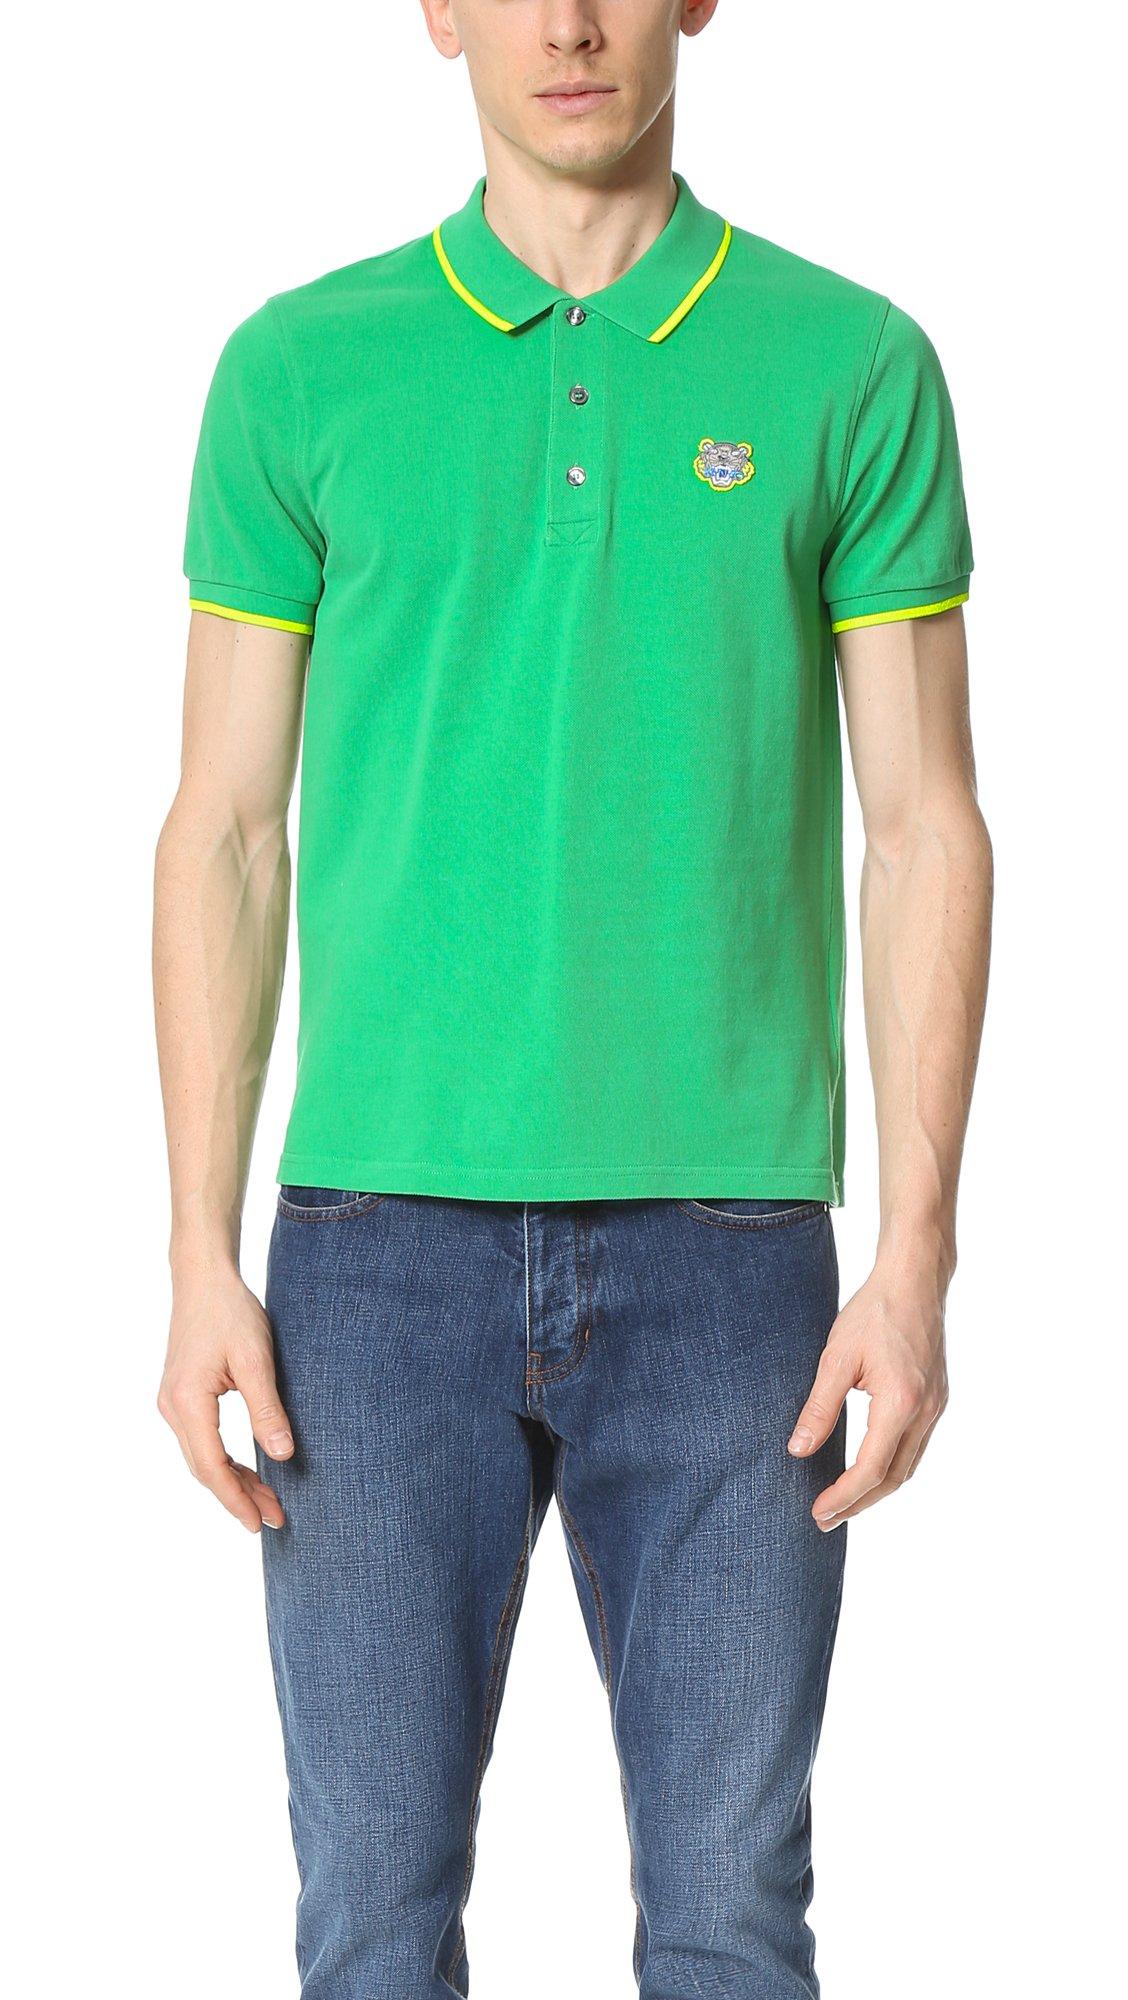 Mens Polo Shirt Lime Green Bcd Tofu House